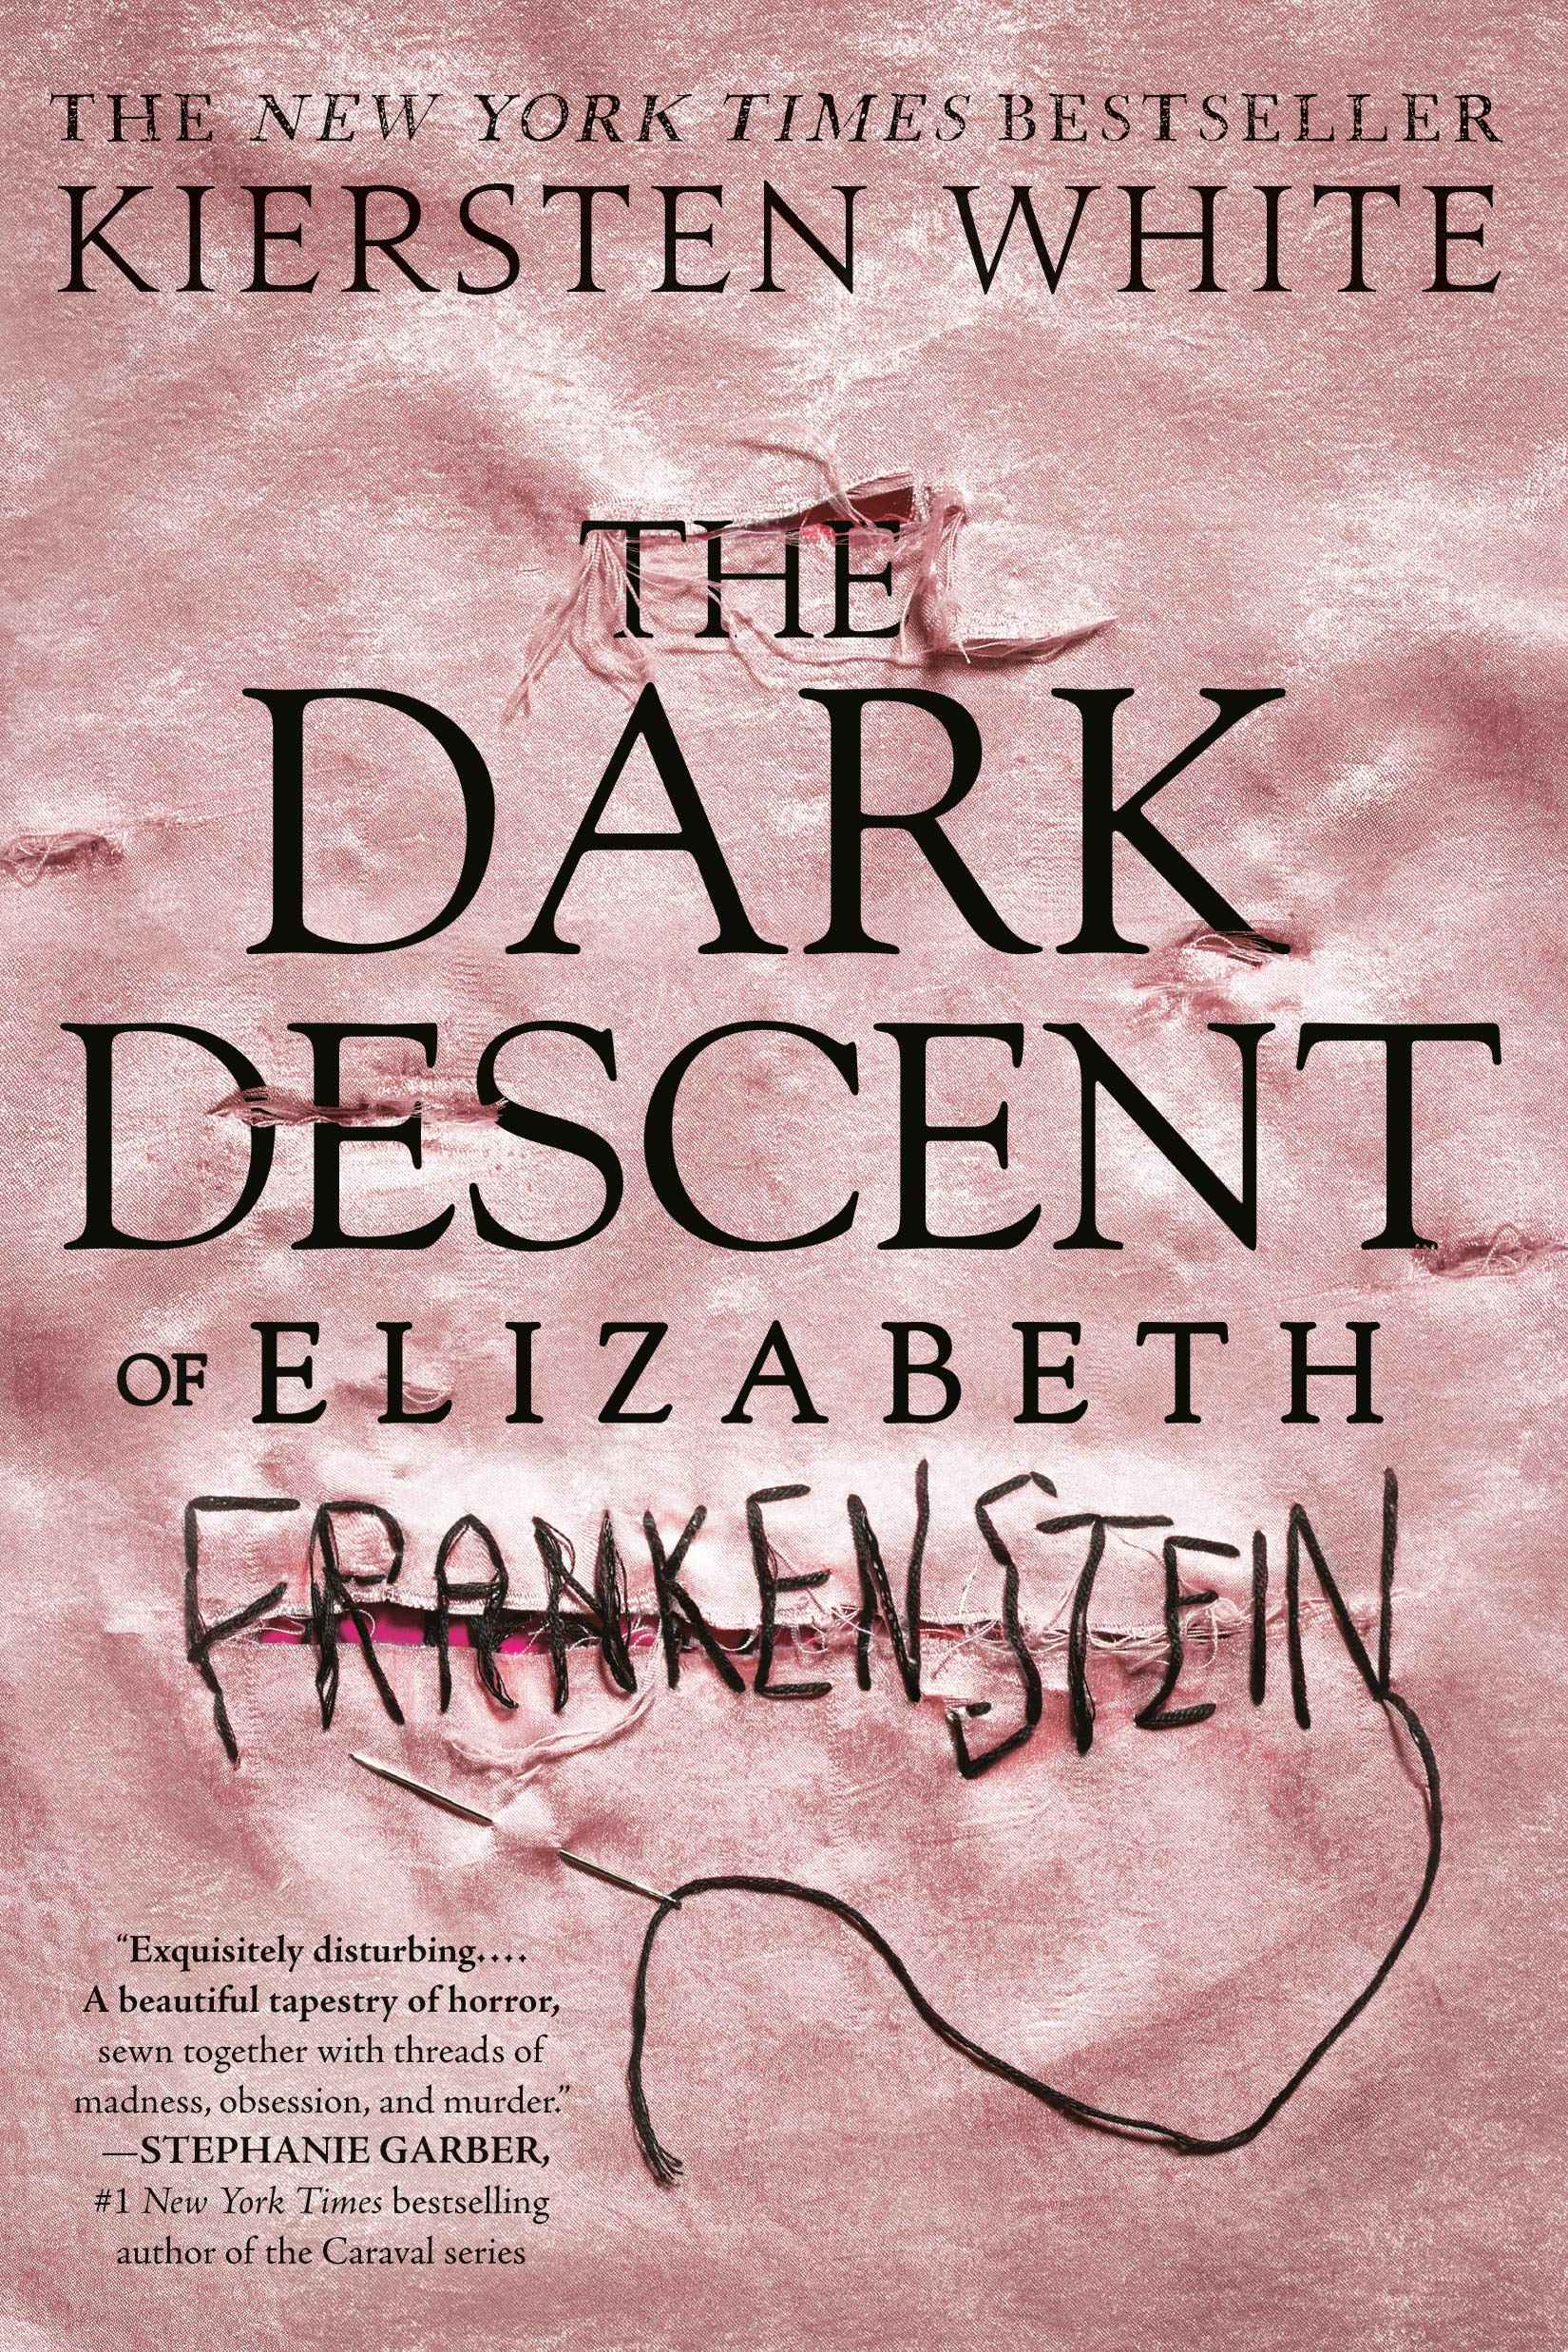 The Dark Decent of Elizabeth Frankenstein _spooky season books